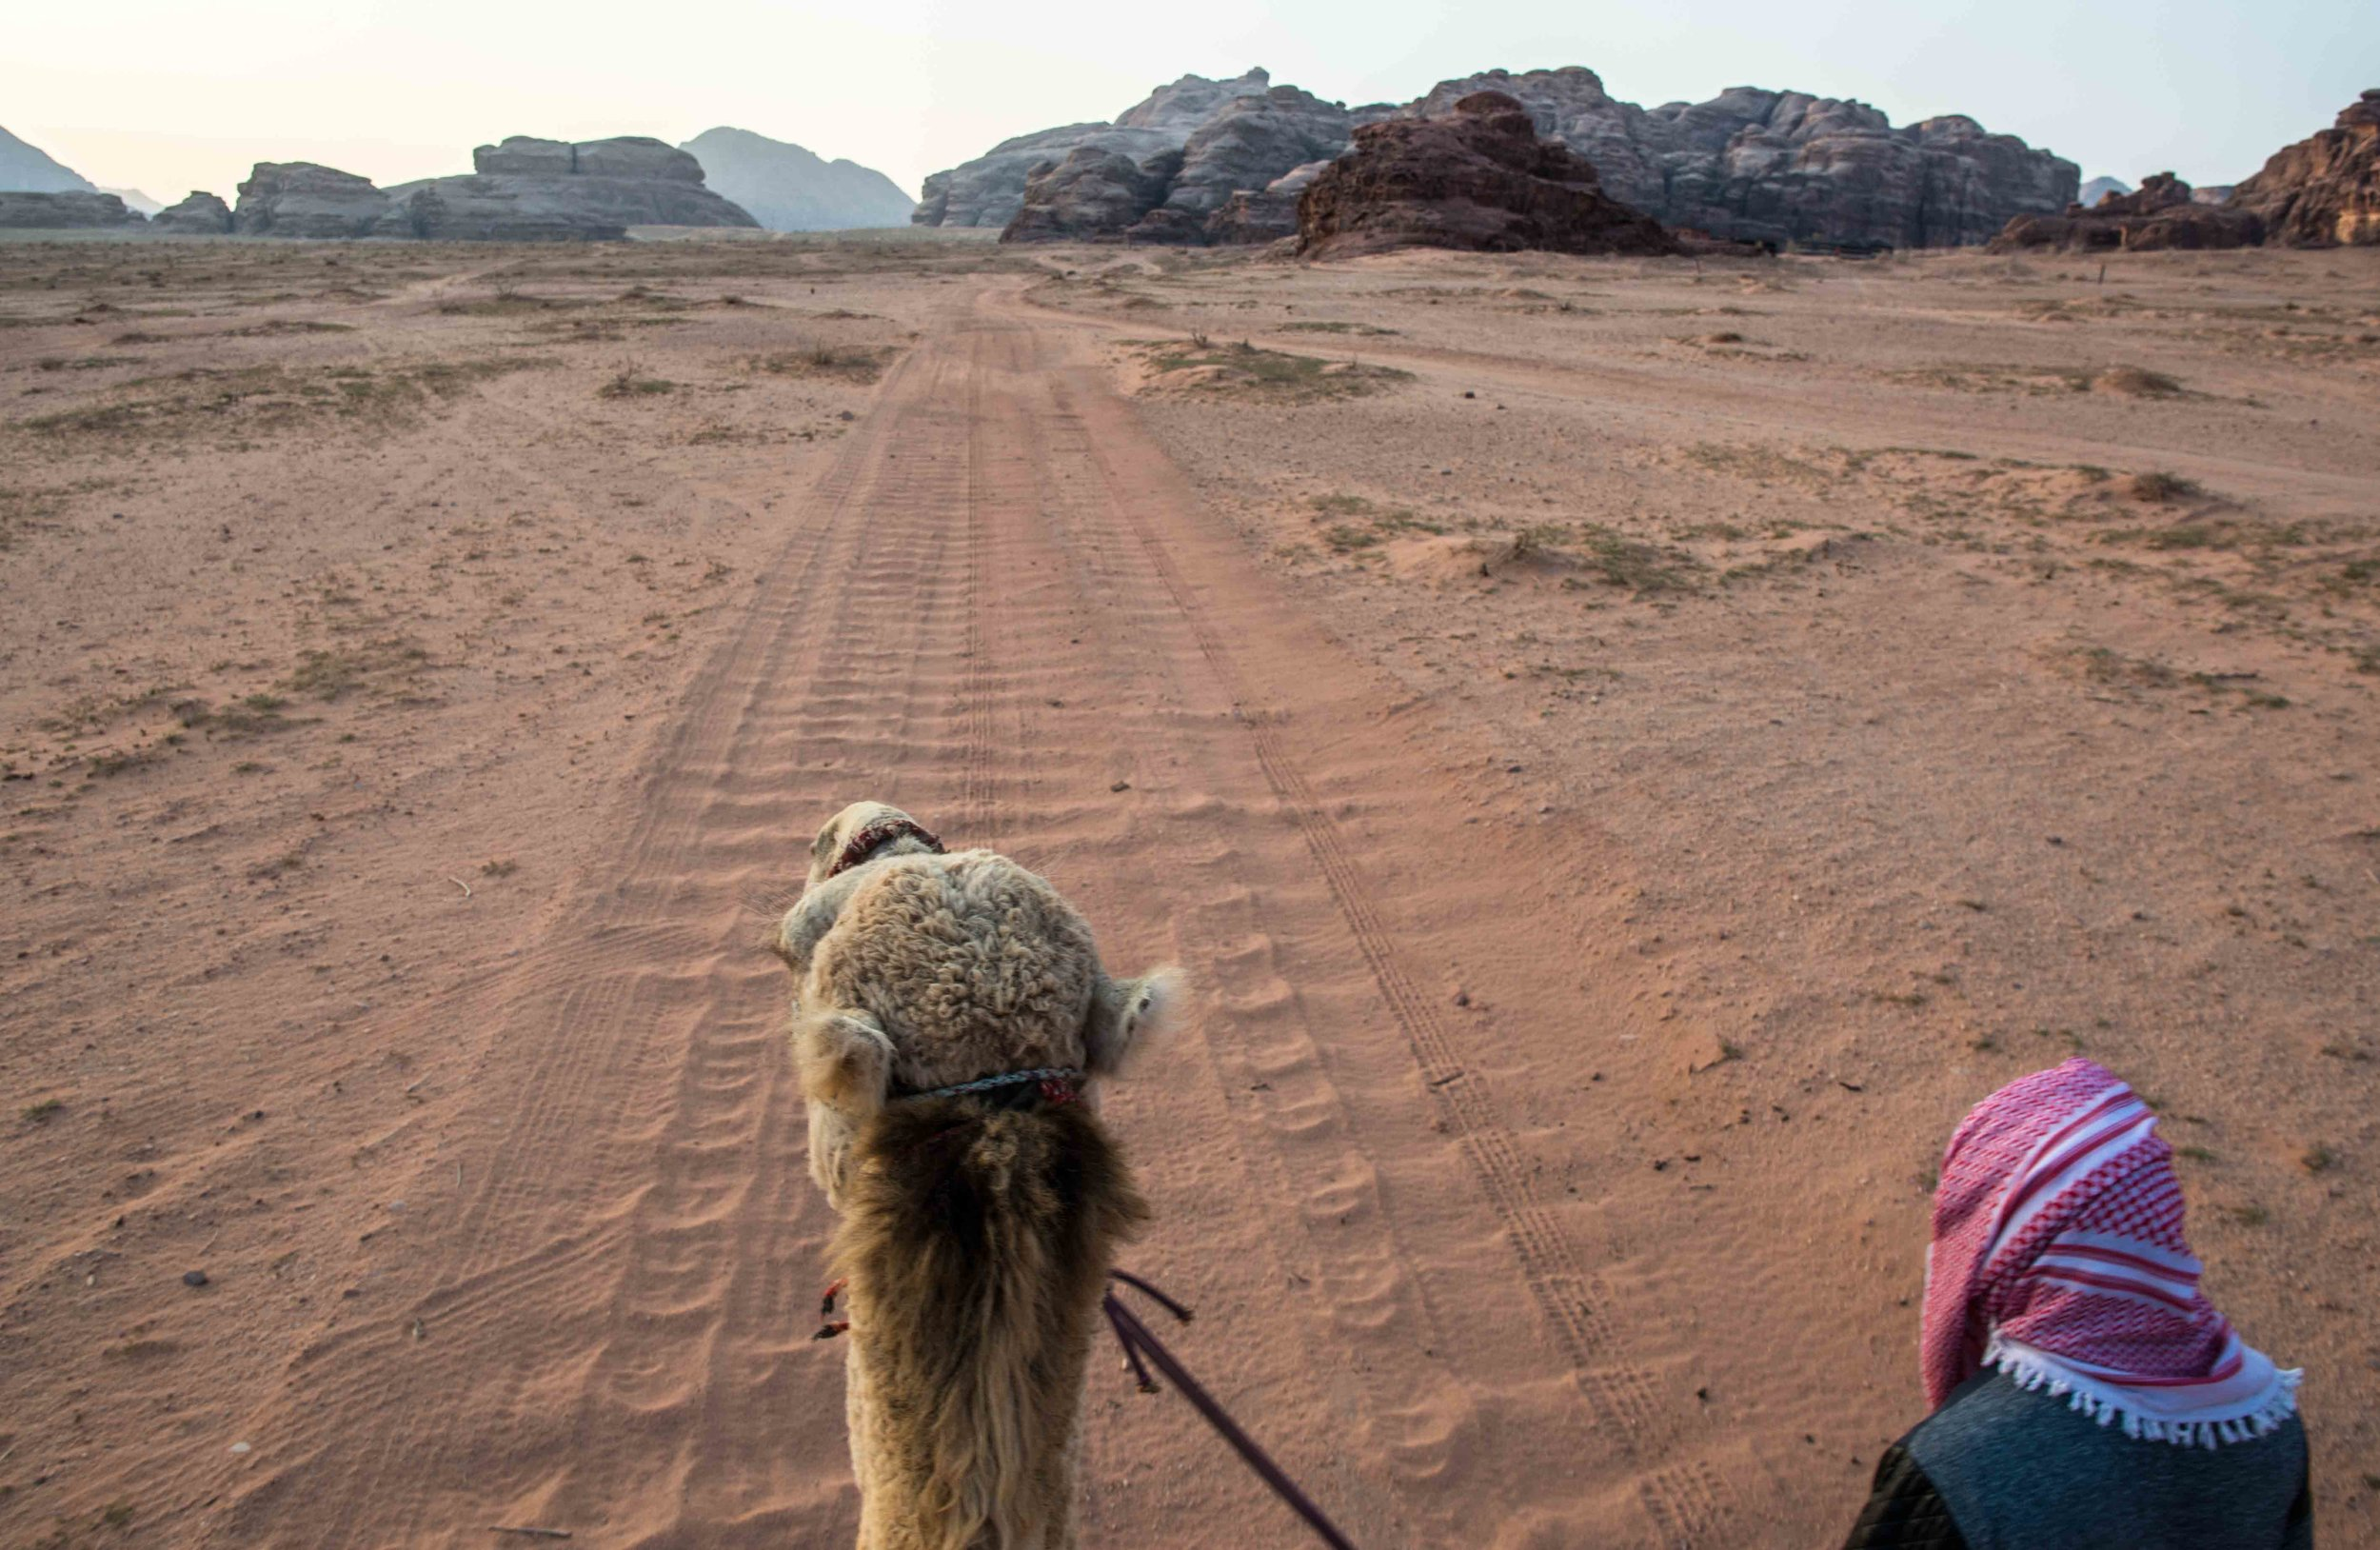 Camel Trekking in Wadi Rum Jordan